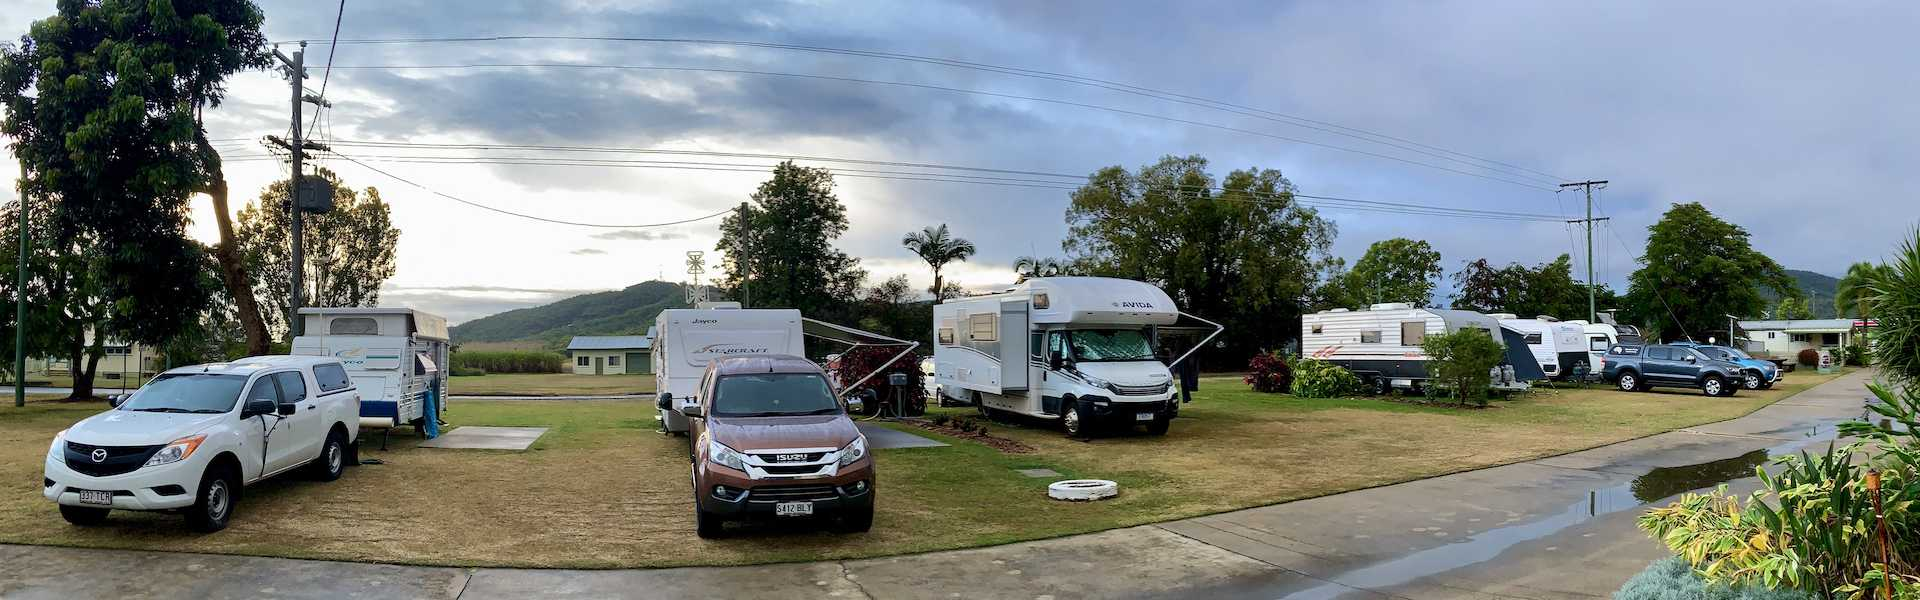 Kui Parks, Carmila Caravan Park, Carmila QLD